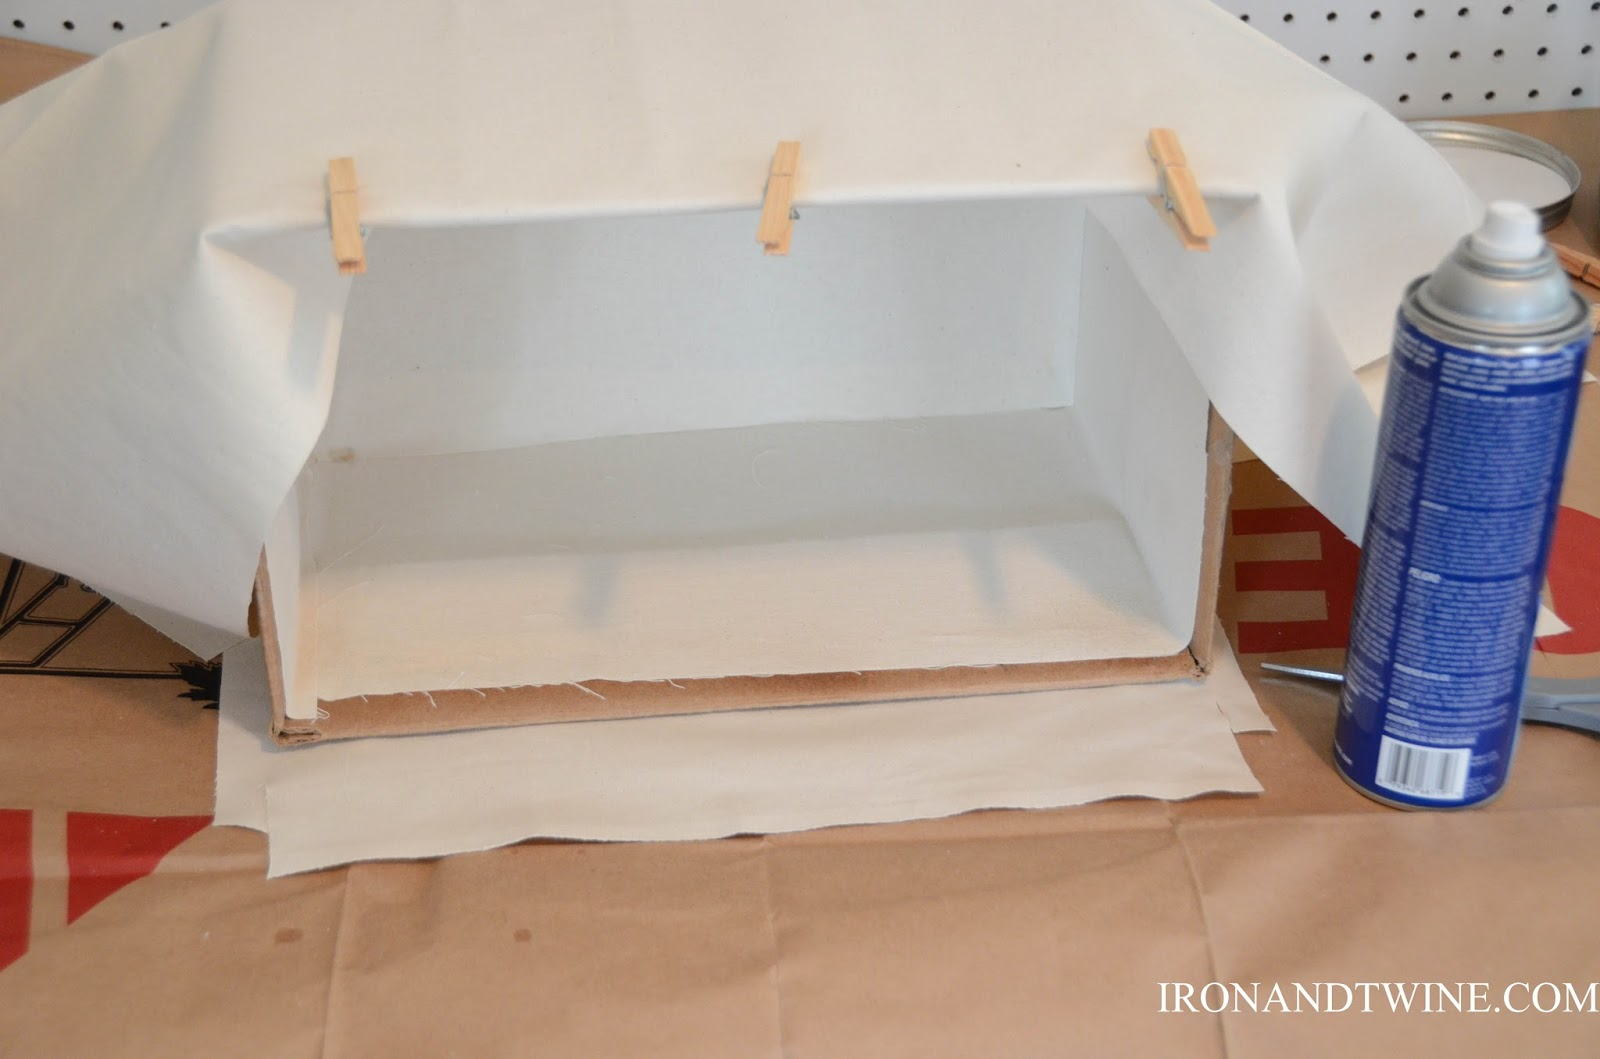 DIY+Belt+Handled+Box,+DIY+fabric+covered+box,+Iron+and+Twine+(24).jpg